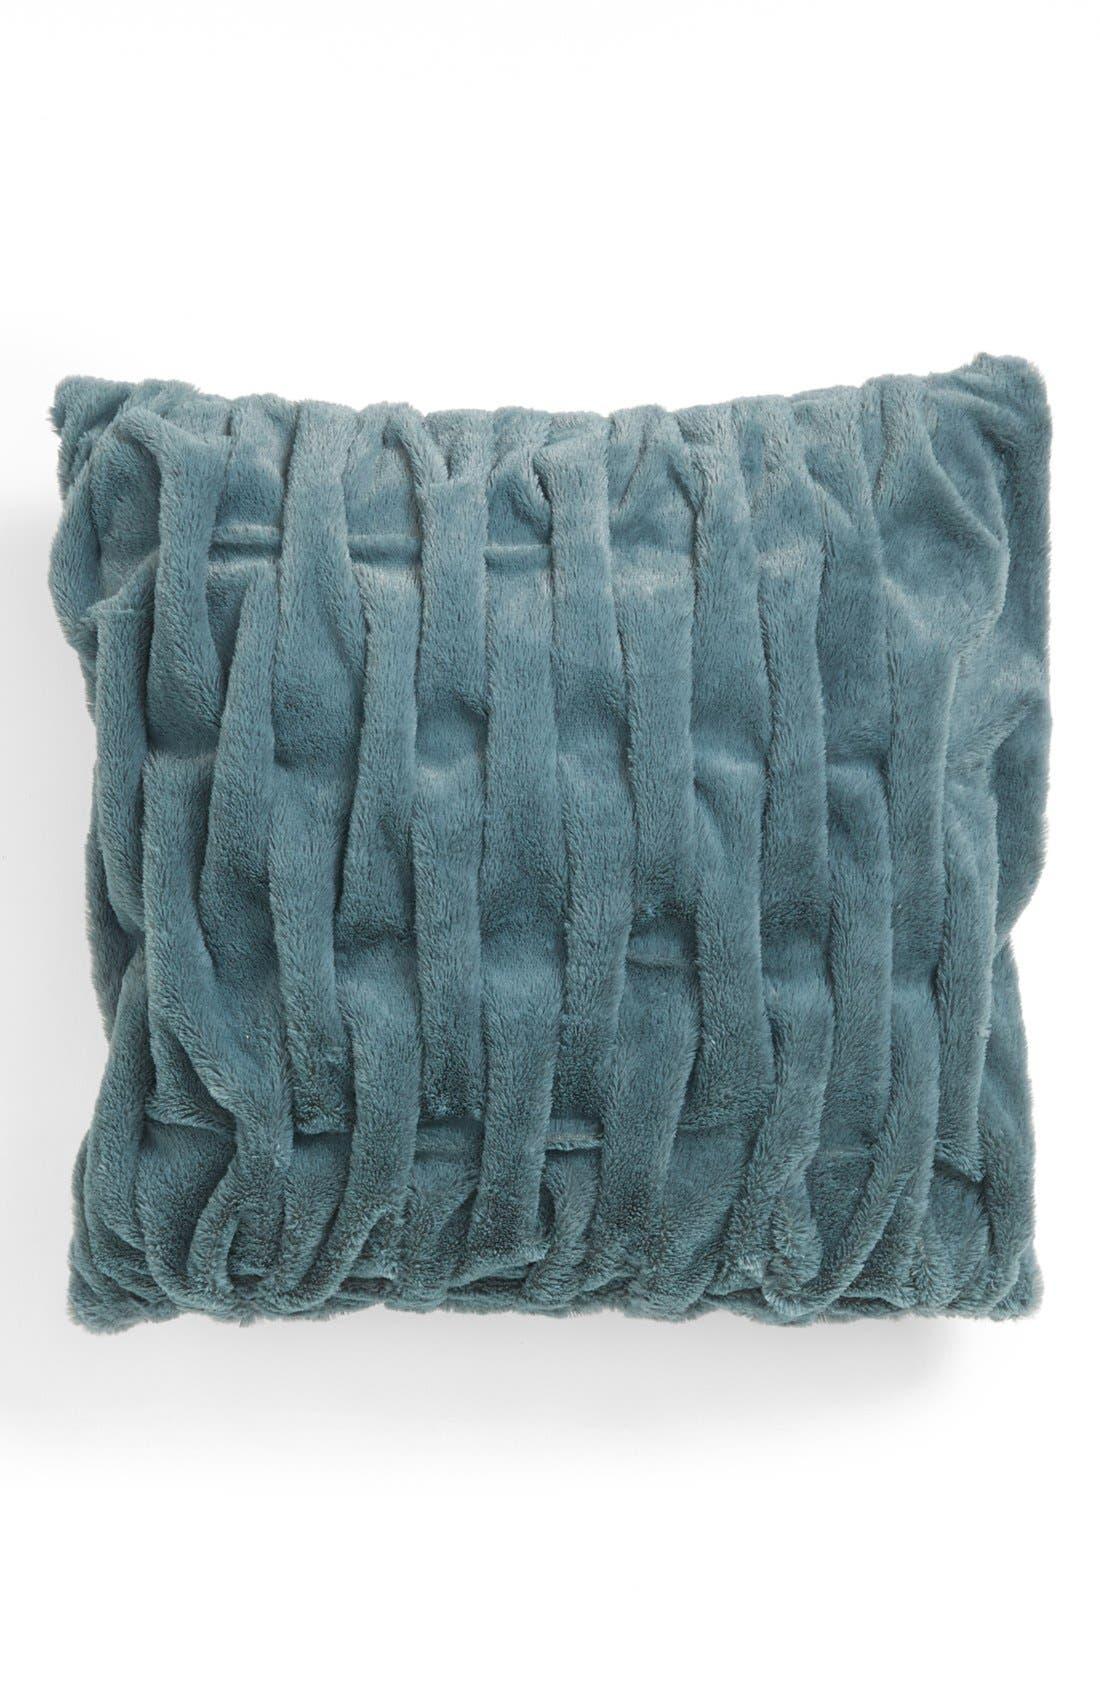 Alternate Image 1 Selected - Spencer N. Home 'Lattice' Pillow